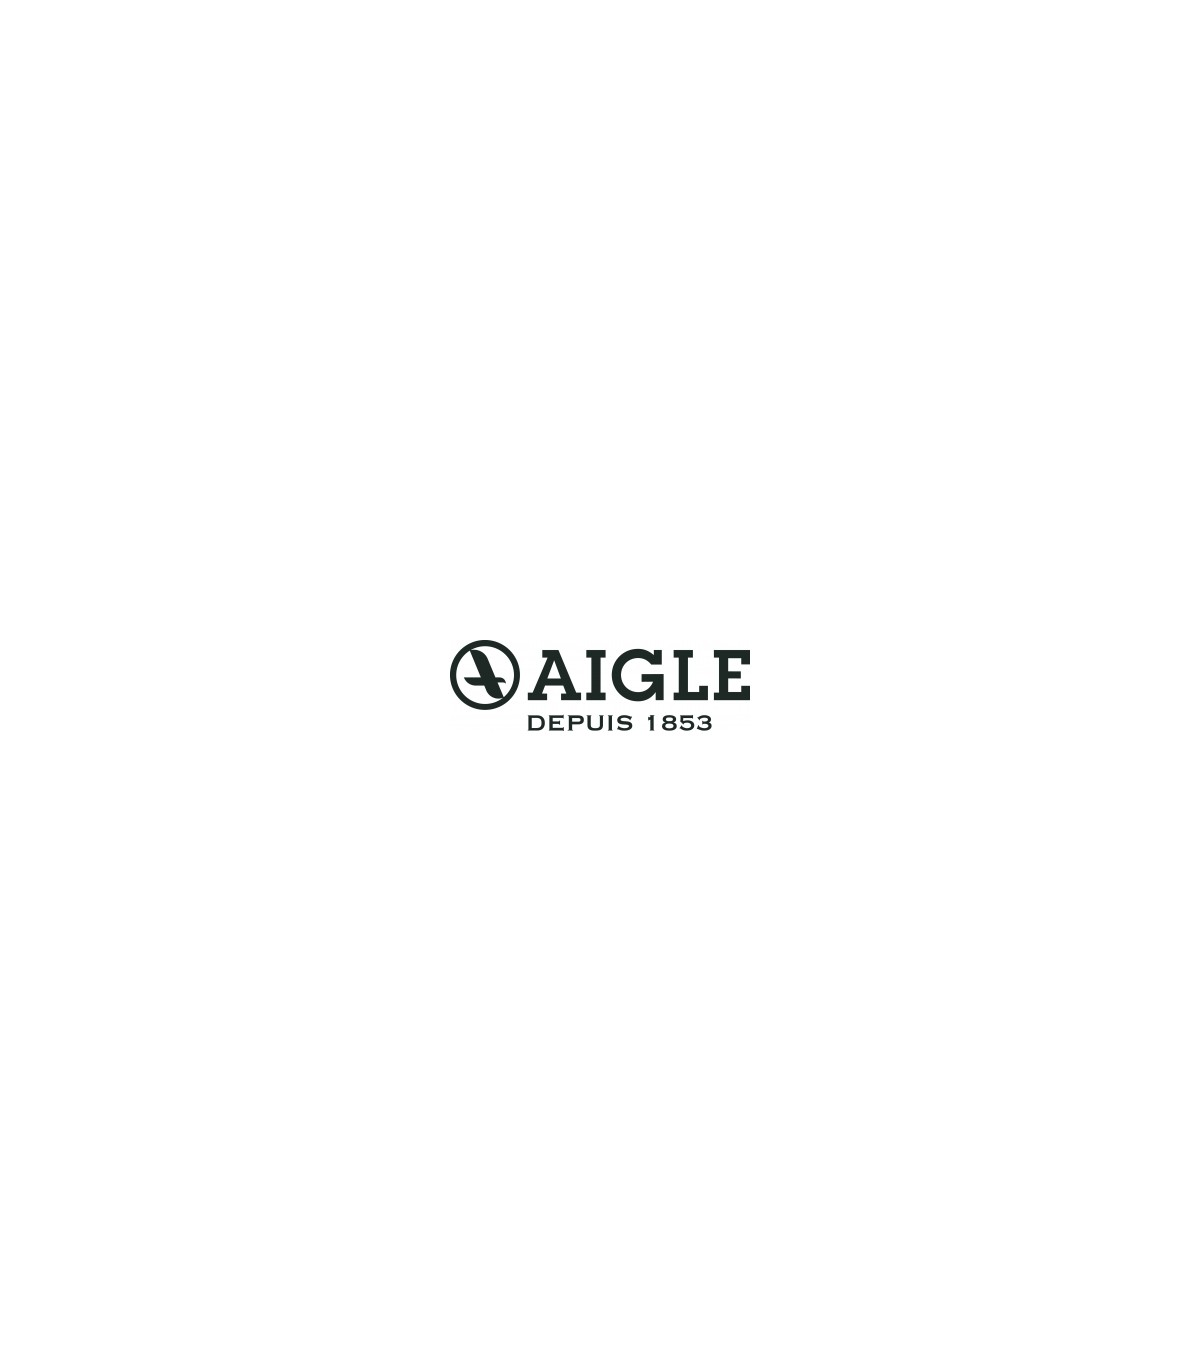 Aigle Clerks Aigle Gilet Gilet Gilet Aigle Clerks Clerks Aigle R354AjL